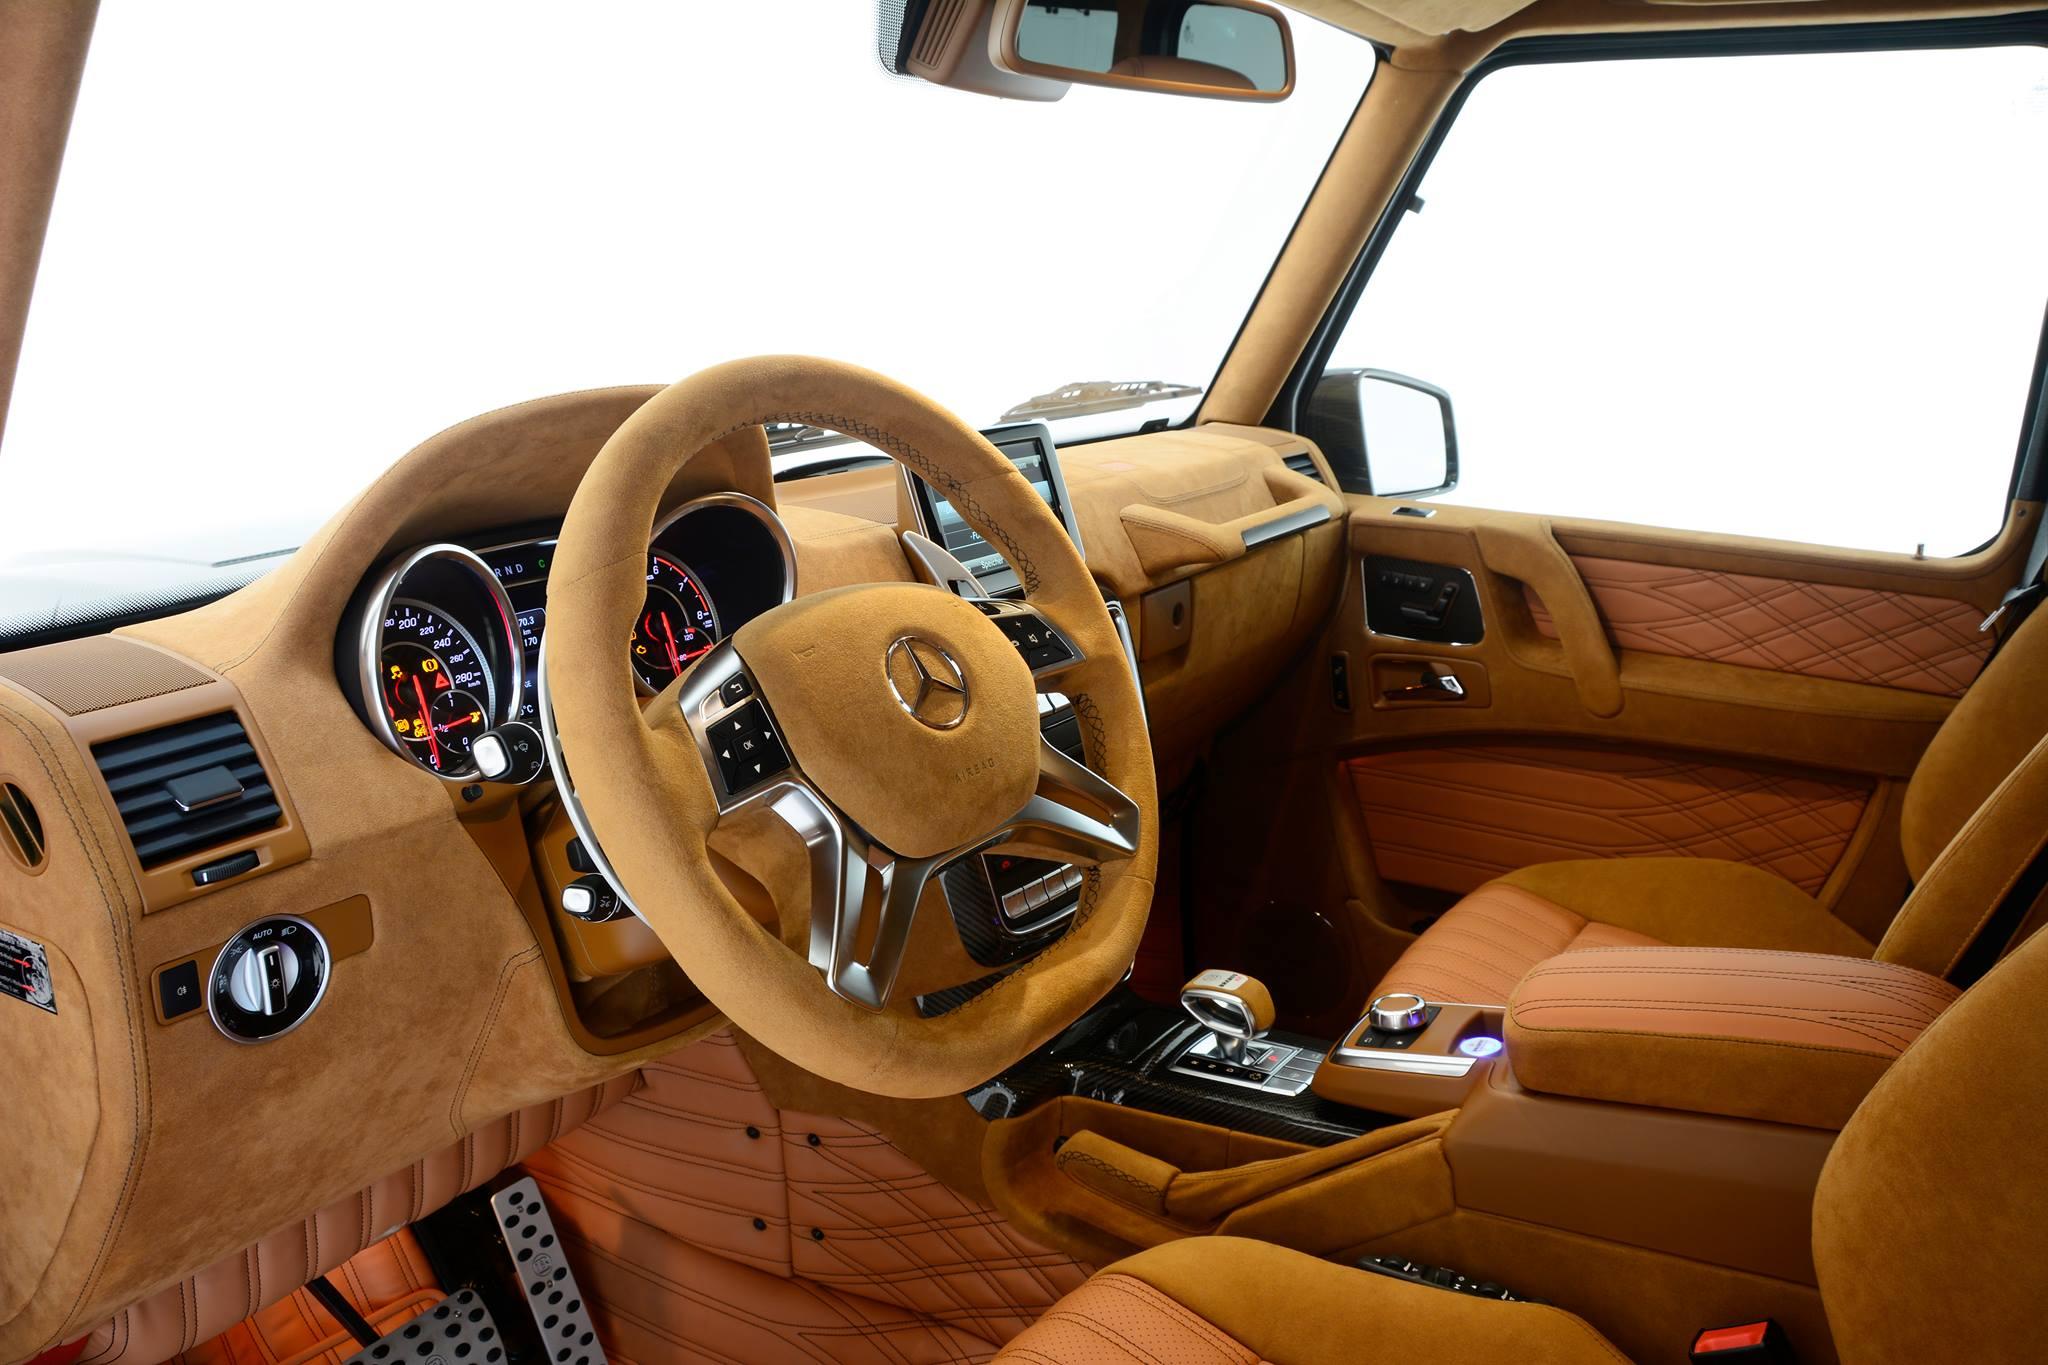 Mercedes Benz G Class G65 Amg Brabus 800 Price Varias Classes